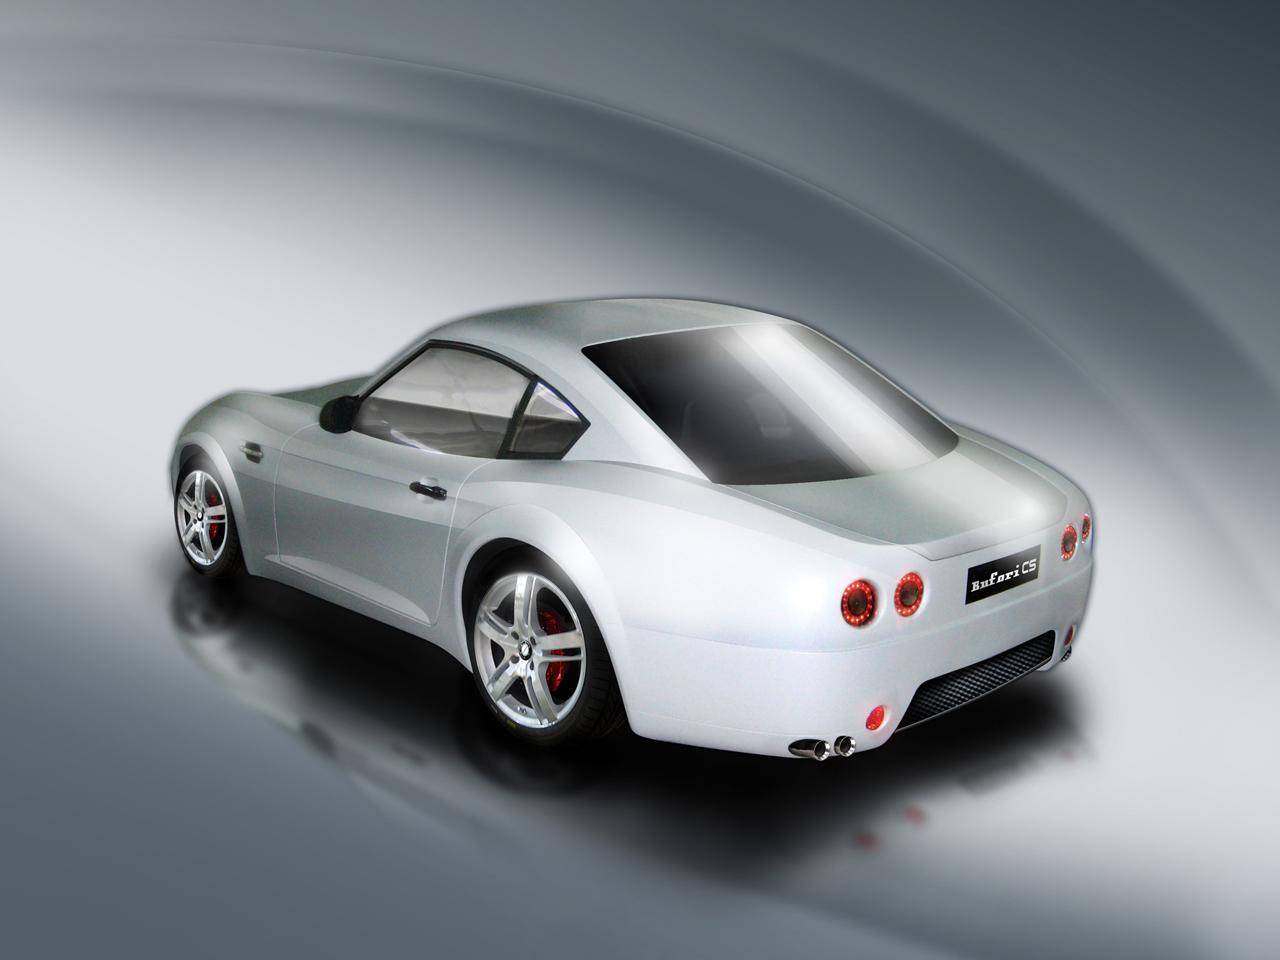 2010 Bufori CS Coupe